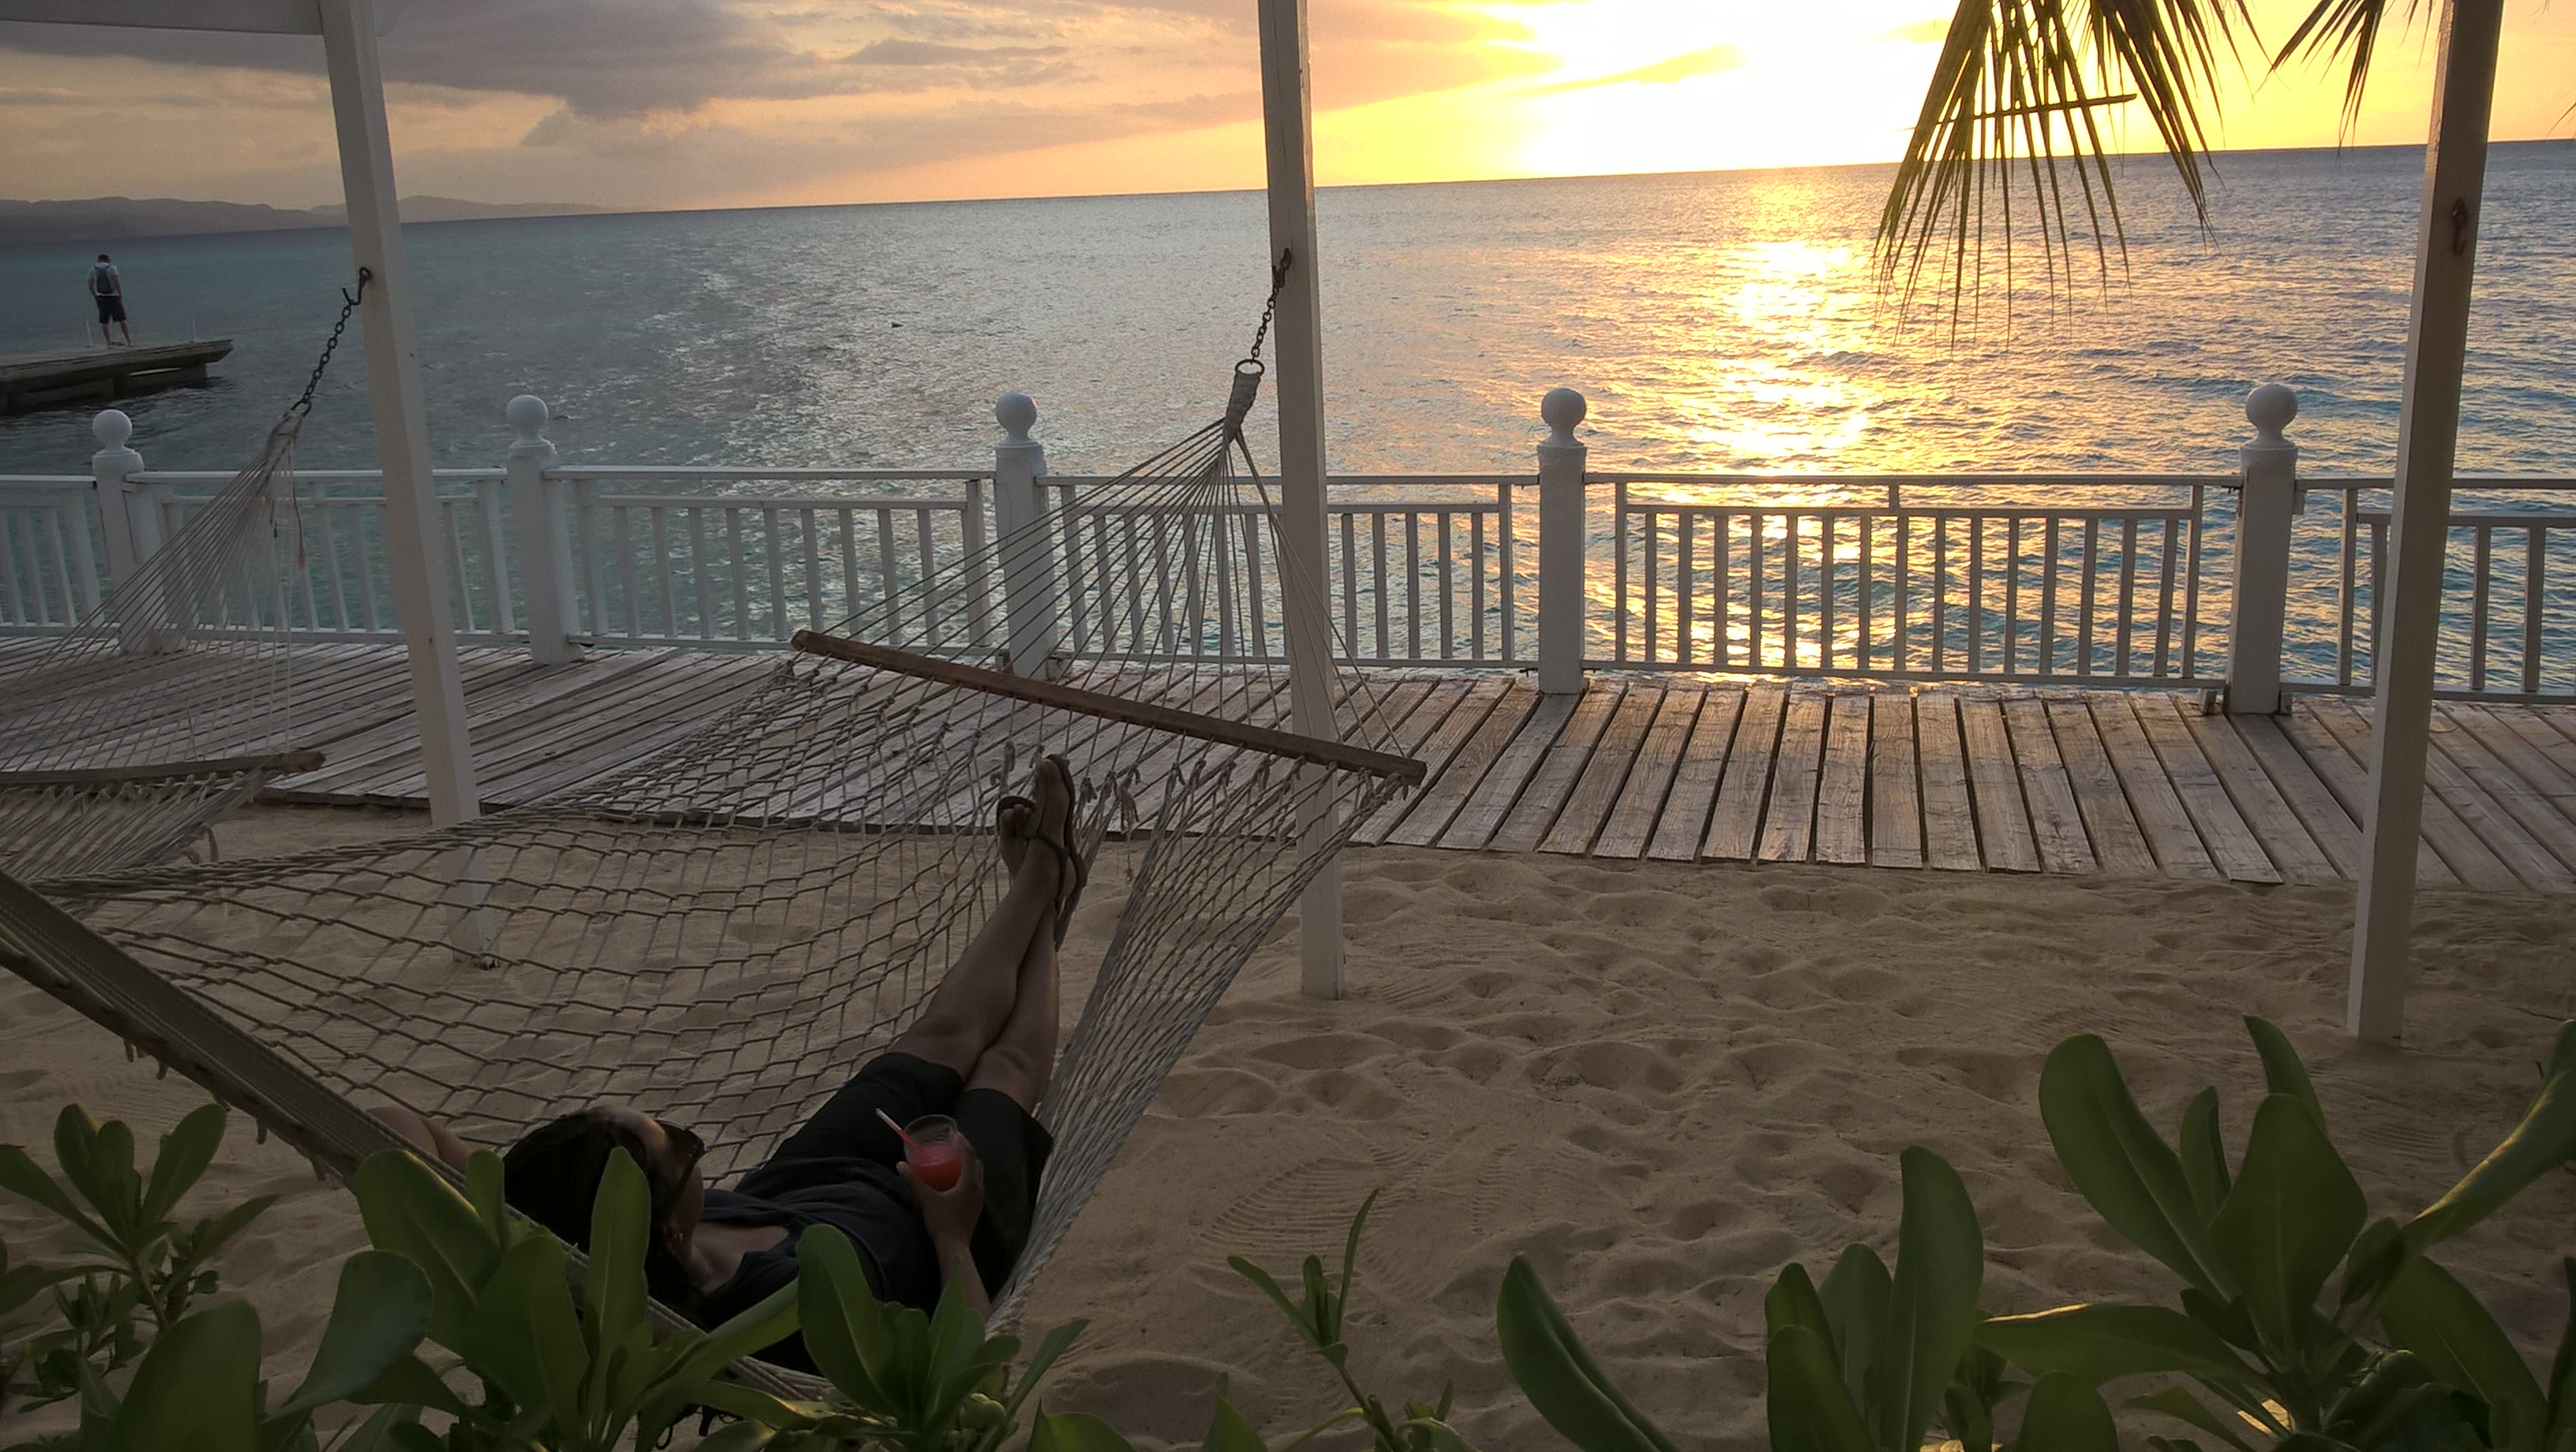 Royal Decameron, Jamaica